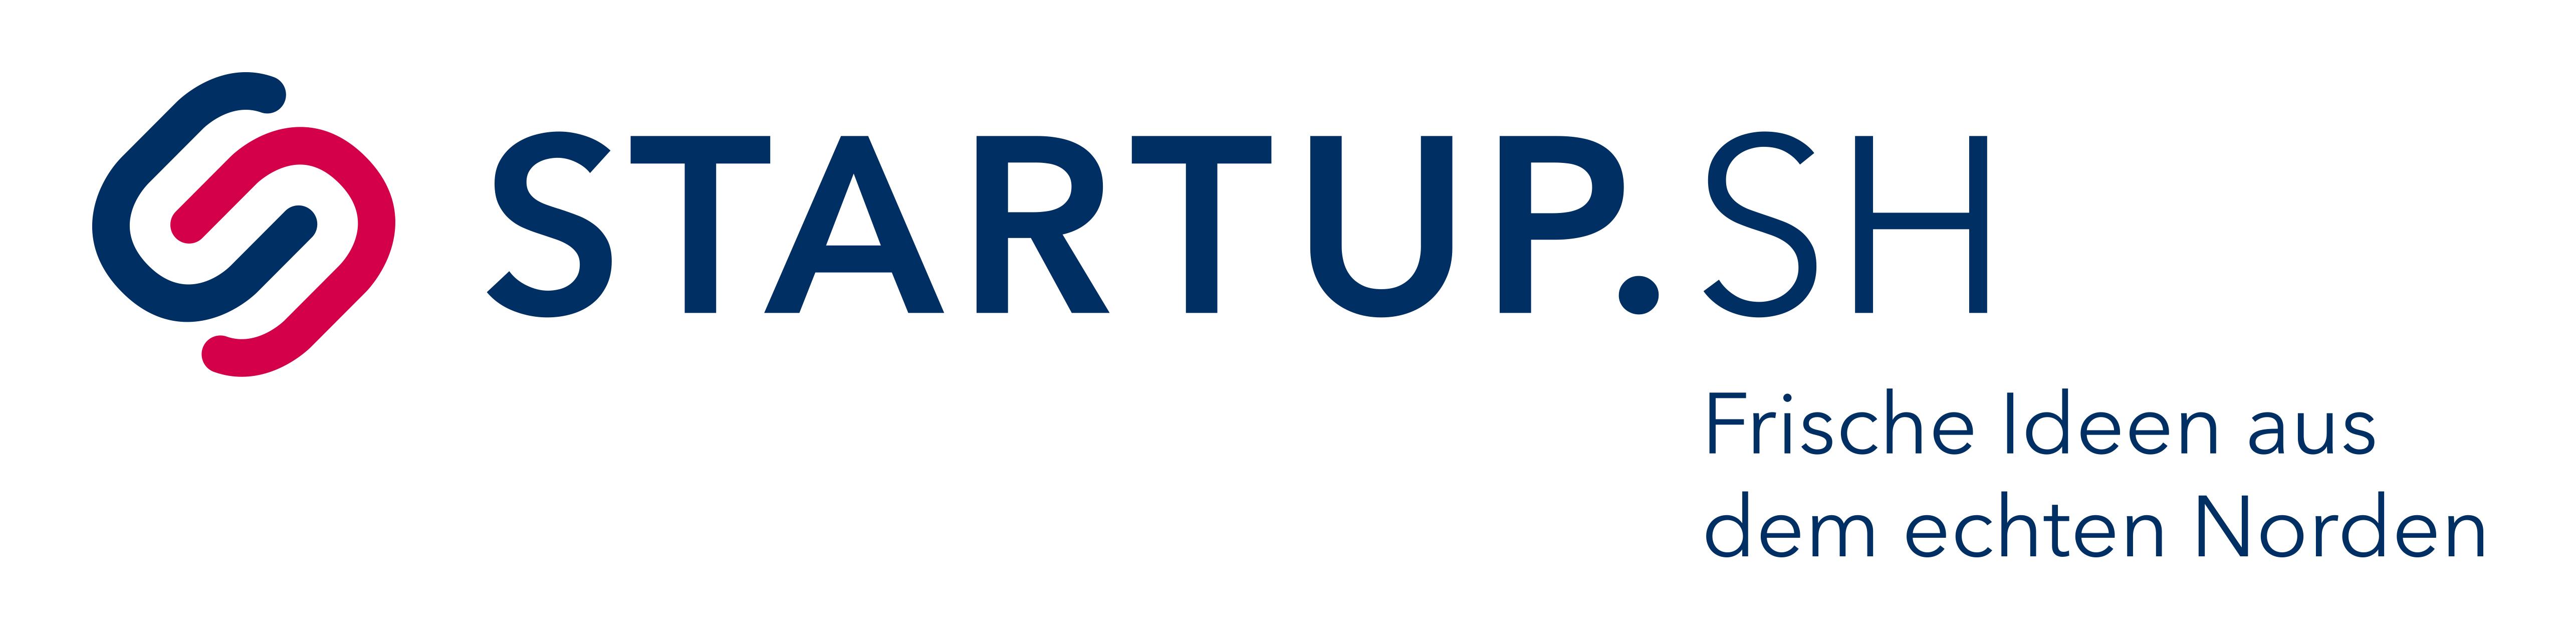 startup_sh_mit_claim